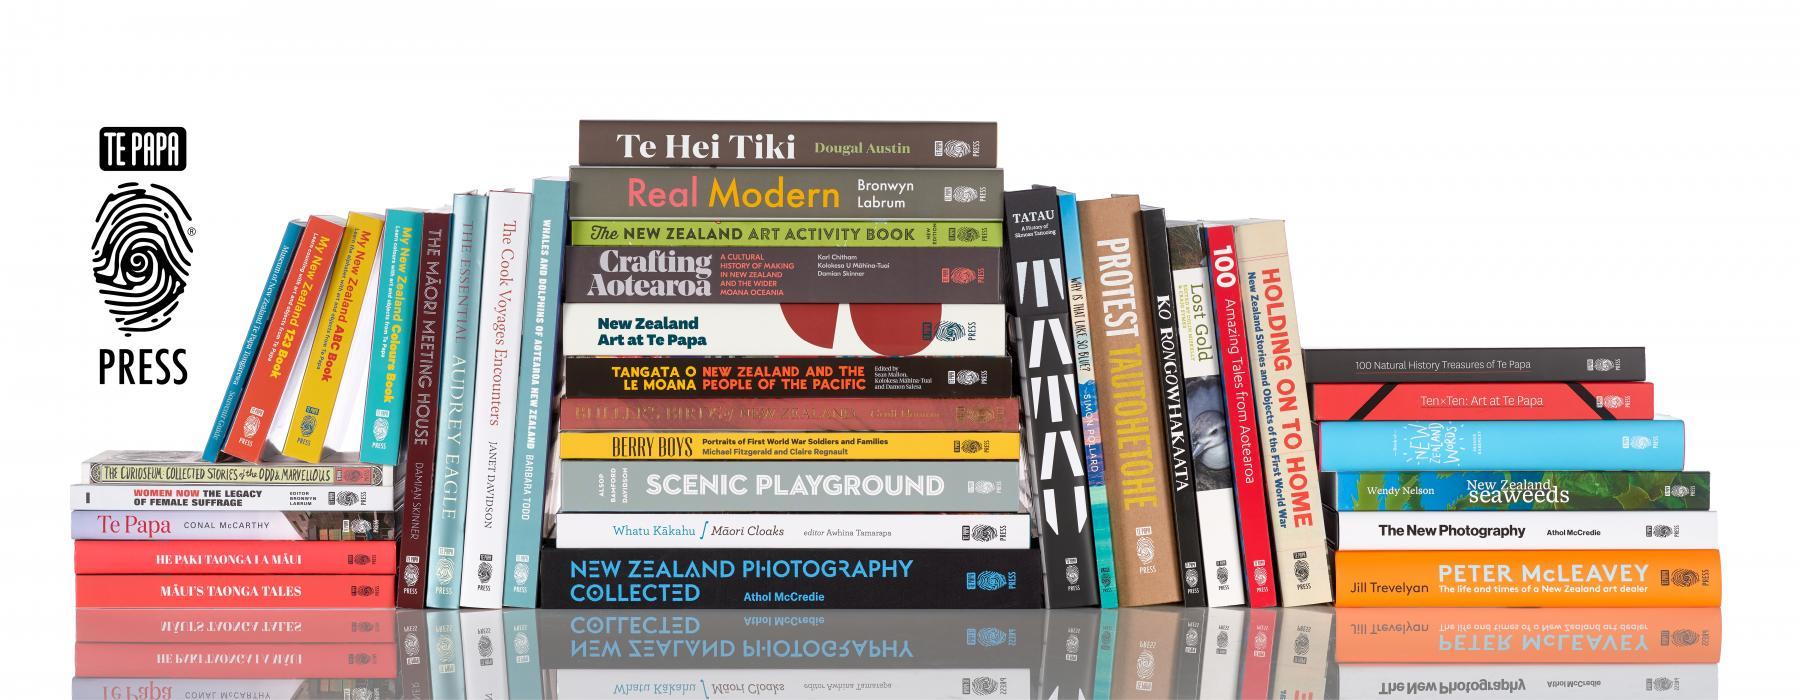 Te Papa Press titles, 2020. Photograph by Maarten Holl. Te Papa.